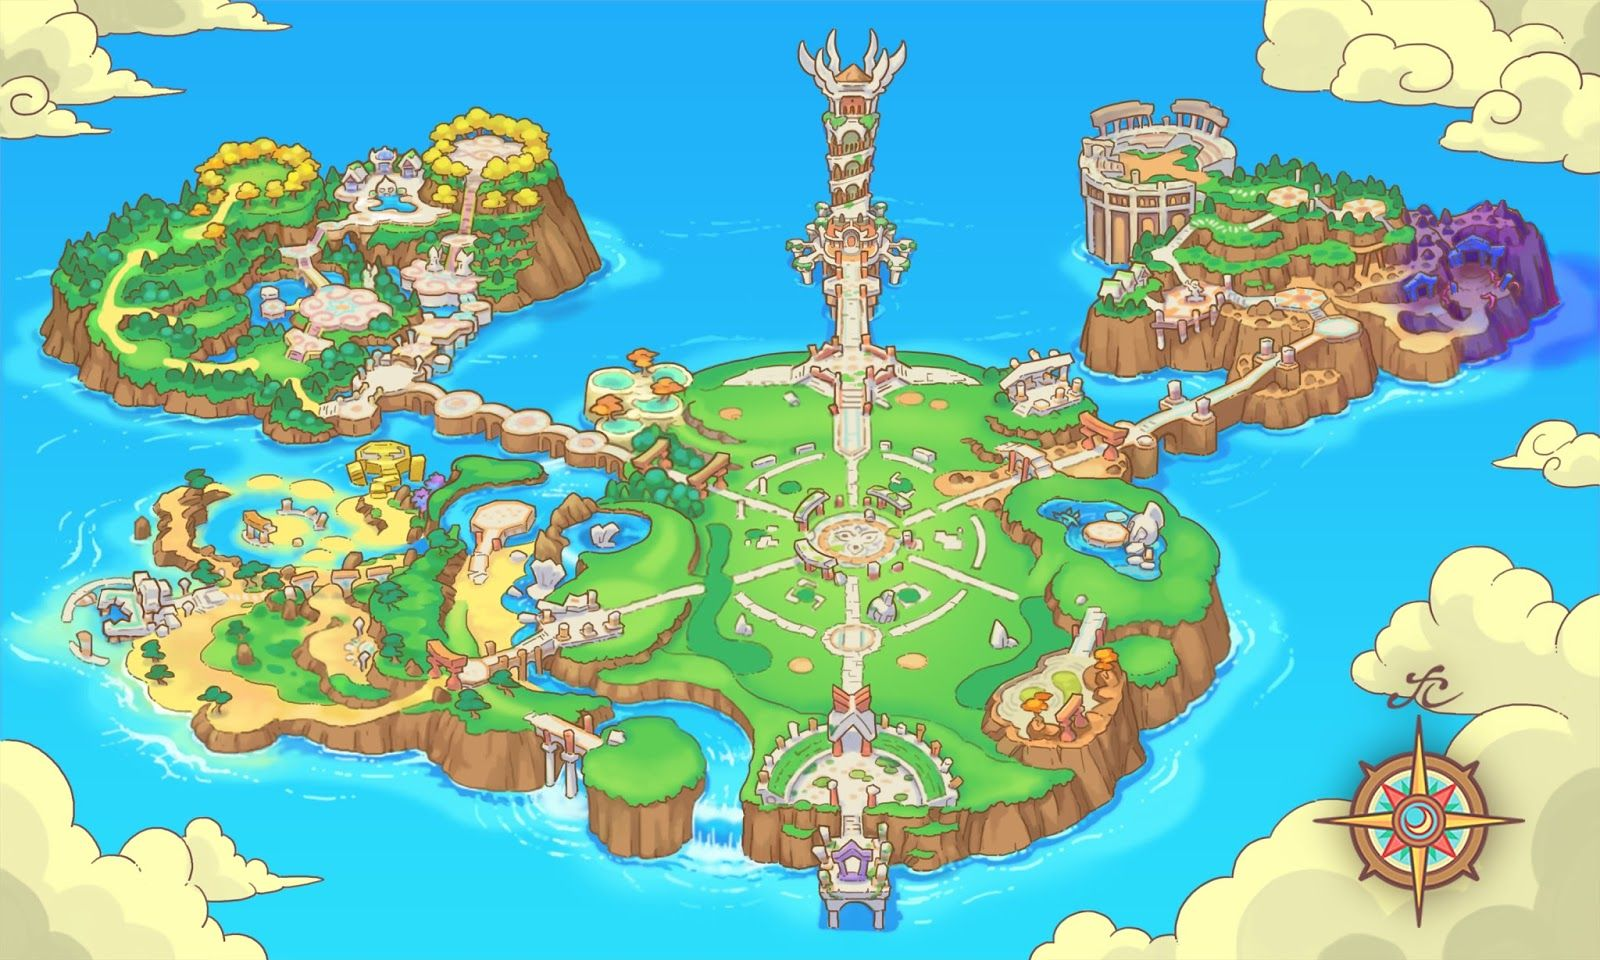 kingdom hearts dream drop distance cia usa